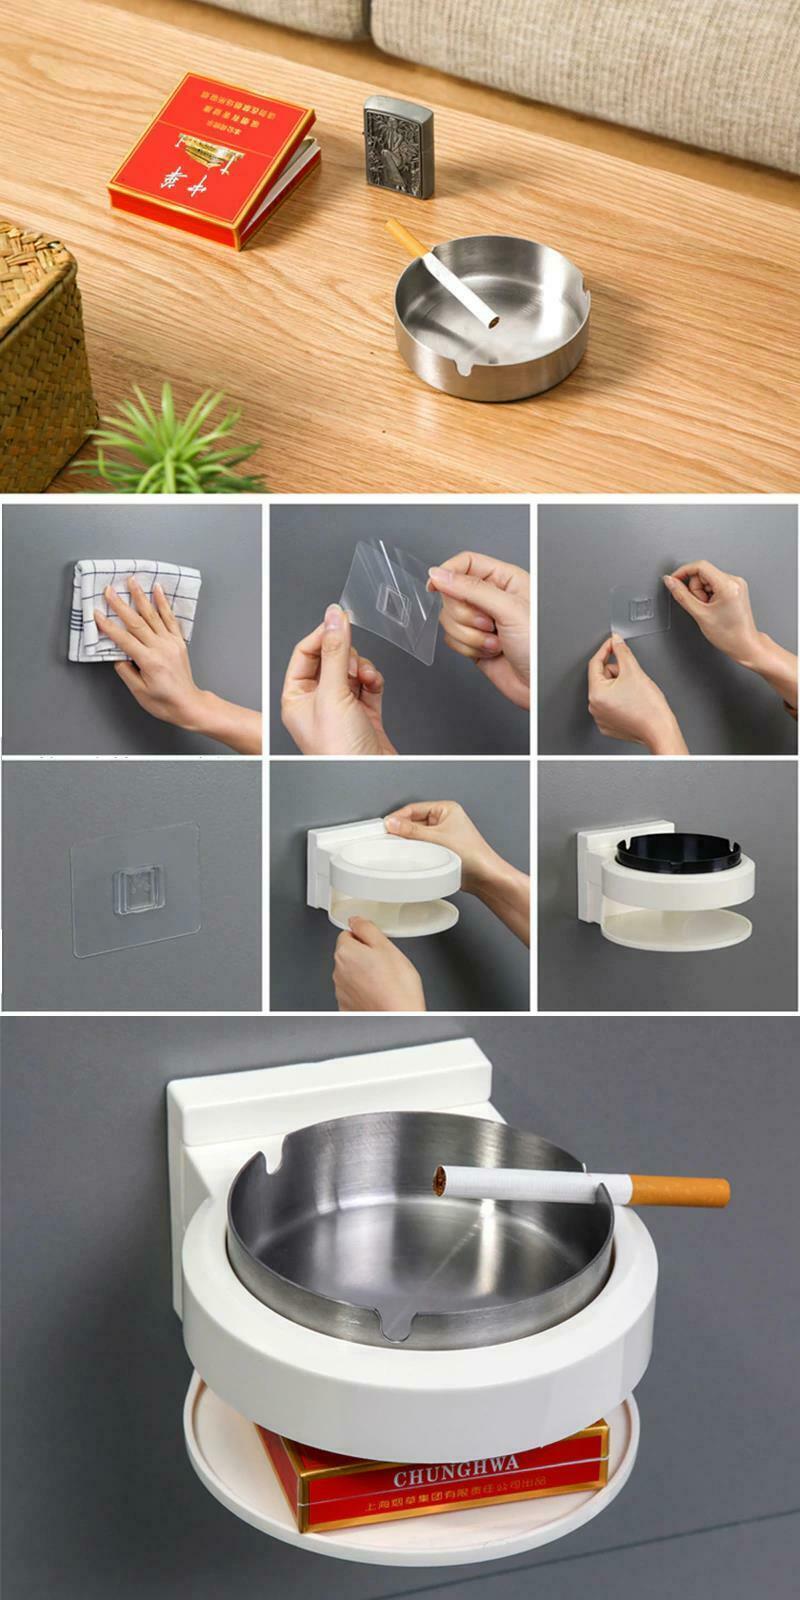 Stainless Steel Ashtray Creative Wall Mounted Bathroom Ash Storage Portable Box image 6